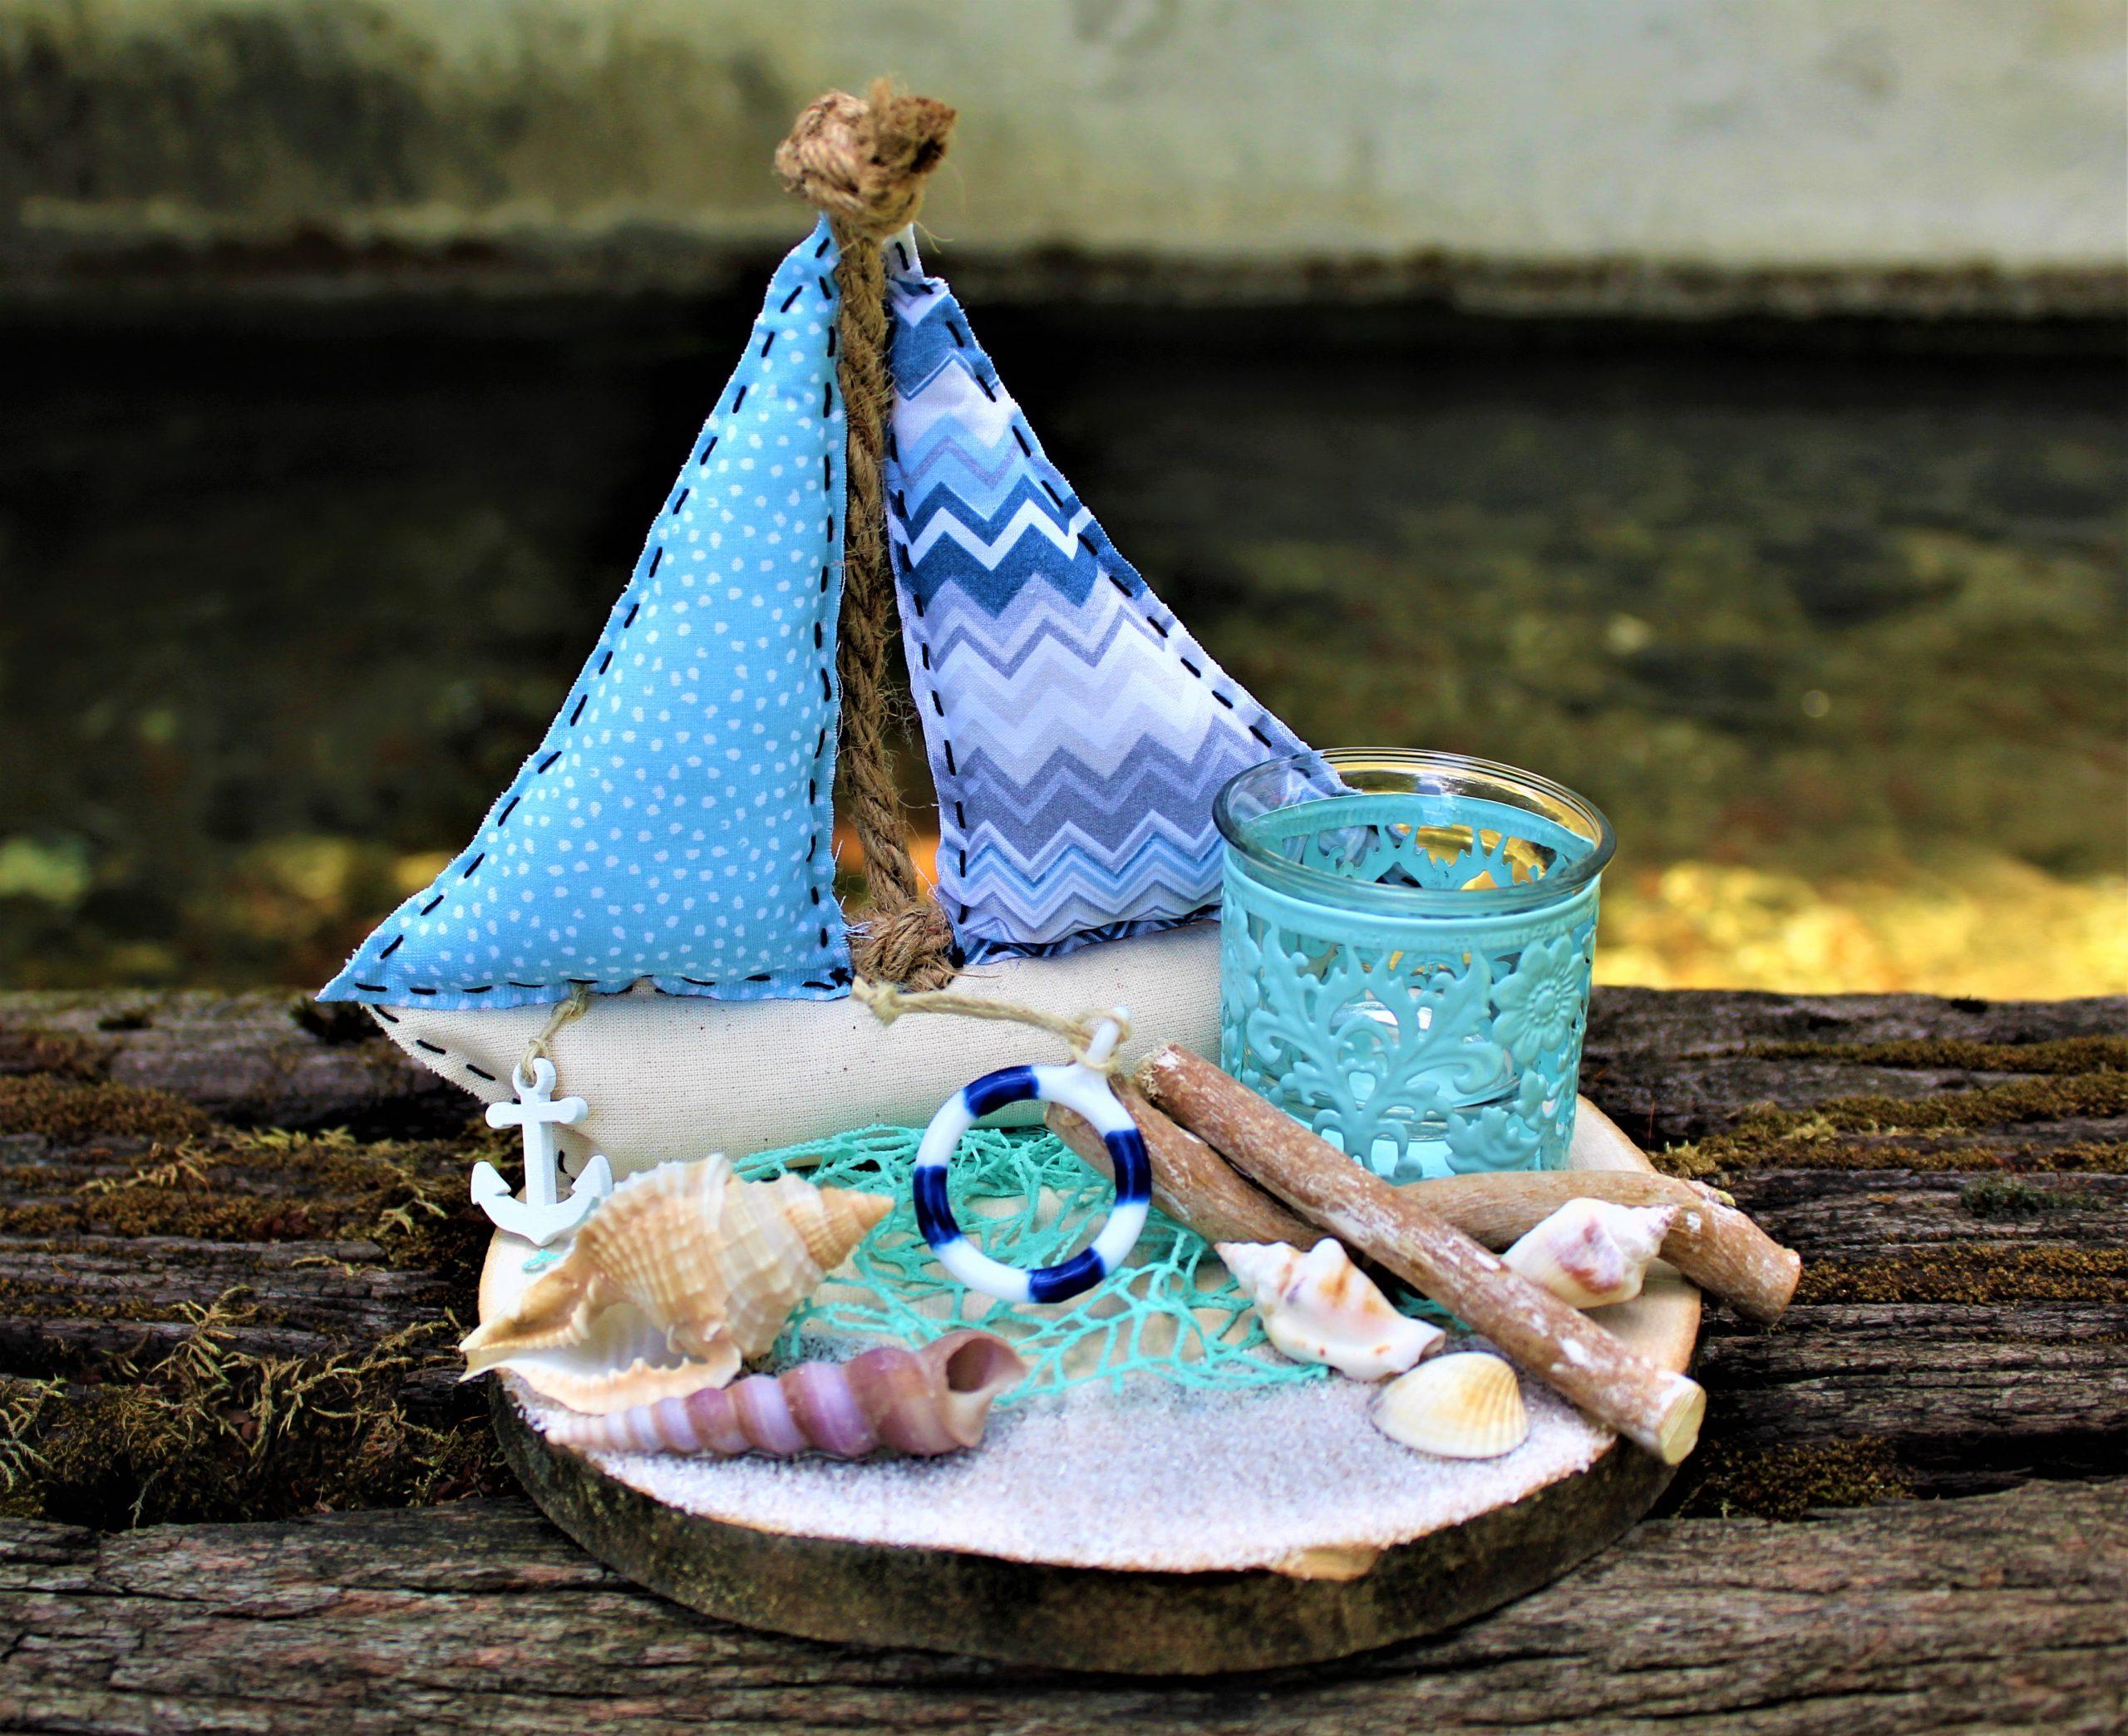 centrotavola-estate-barca-stoffa-conchiglie-porta-candela